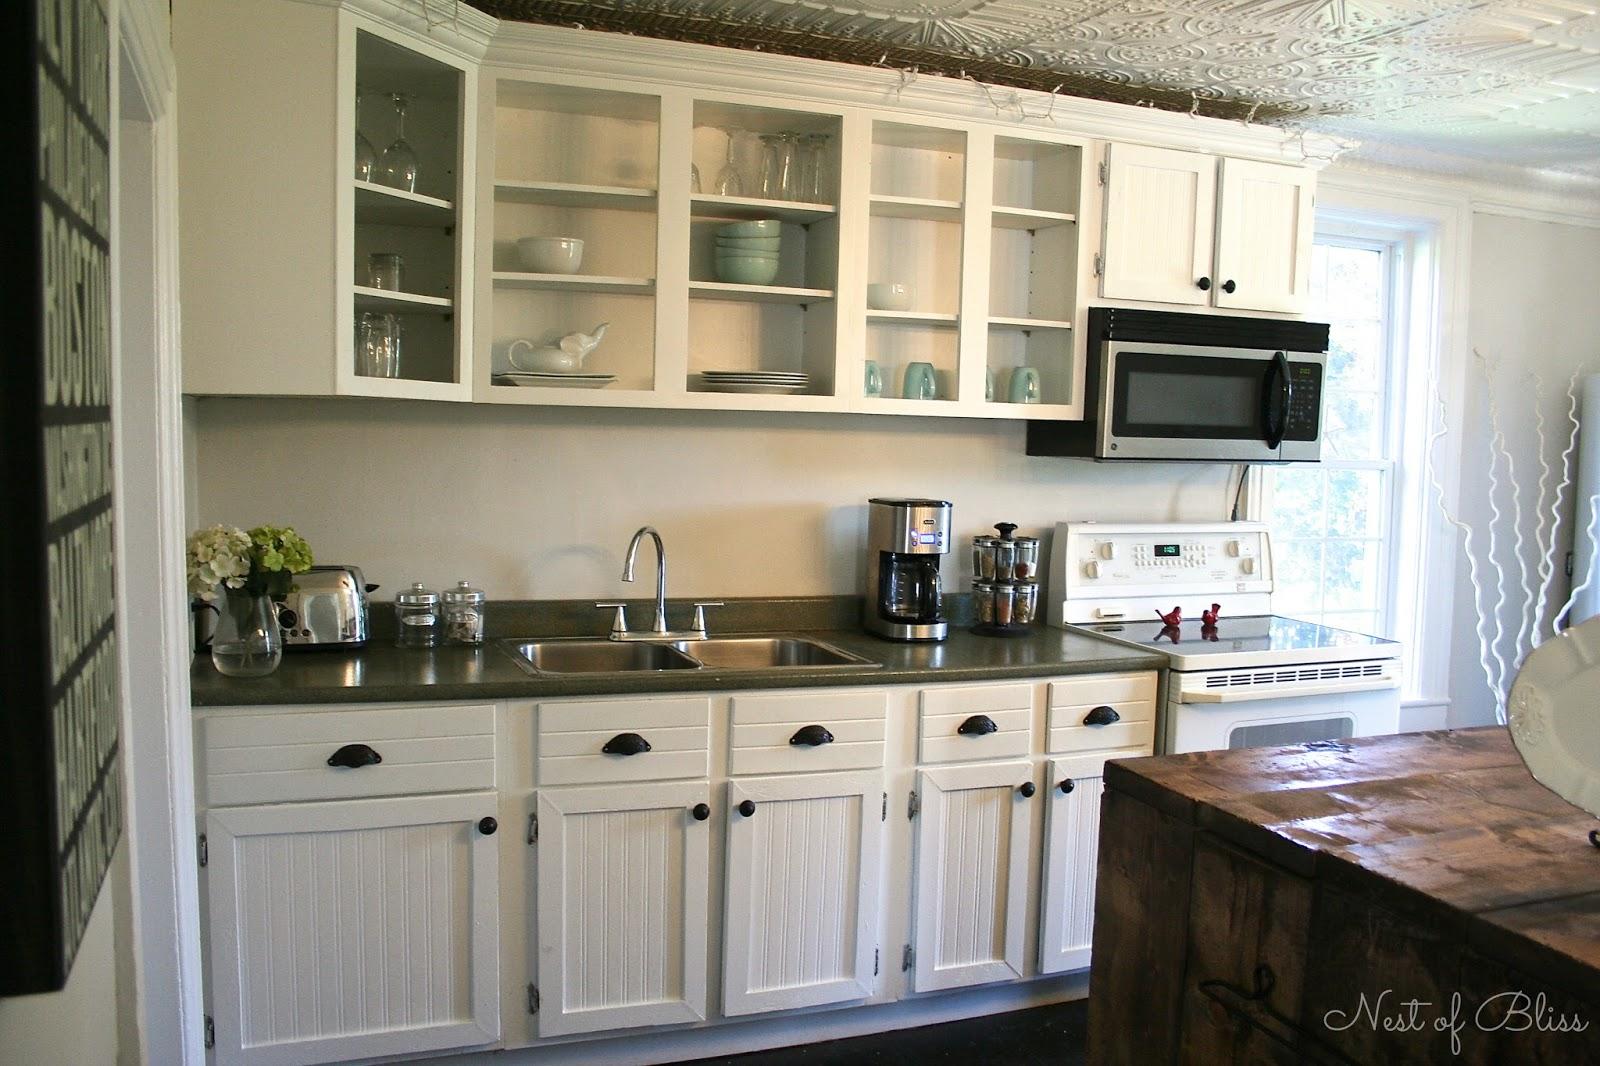 kitchen progress budget kitchen remodel Kitchen Renovation Makeover Progress Before and After